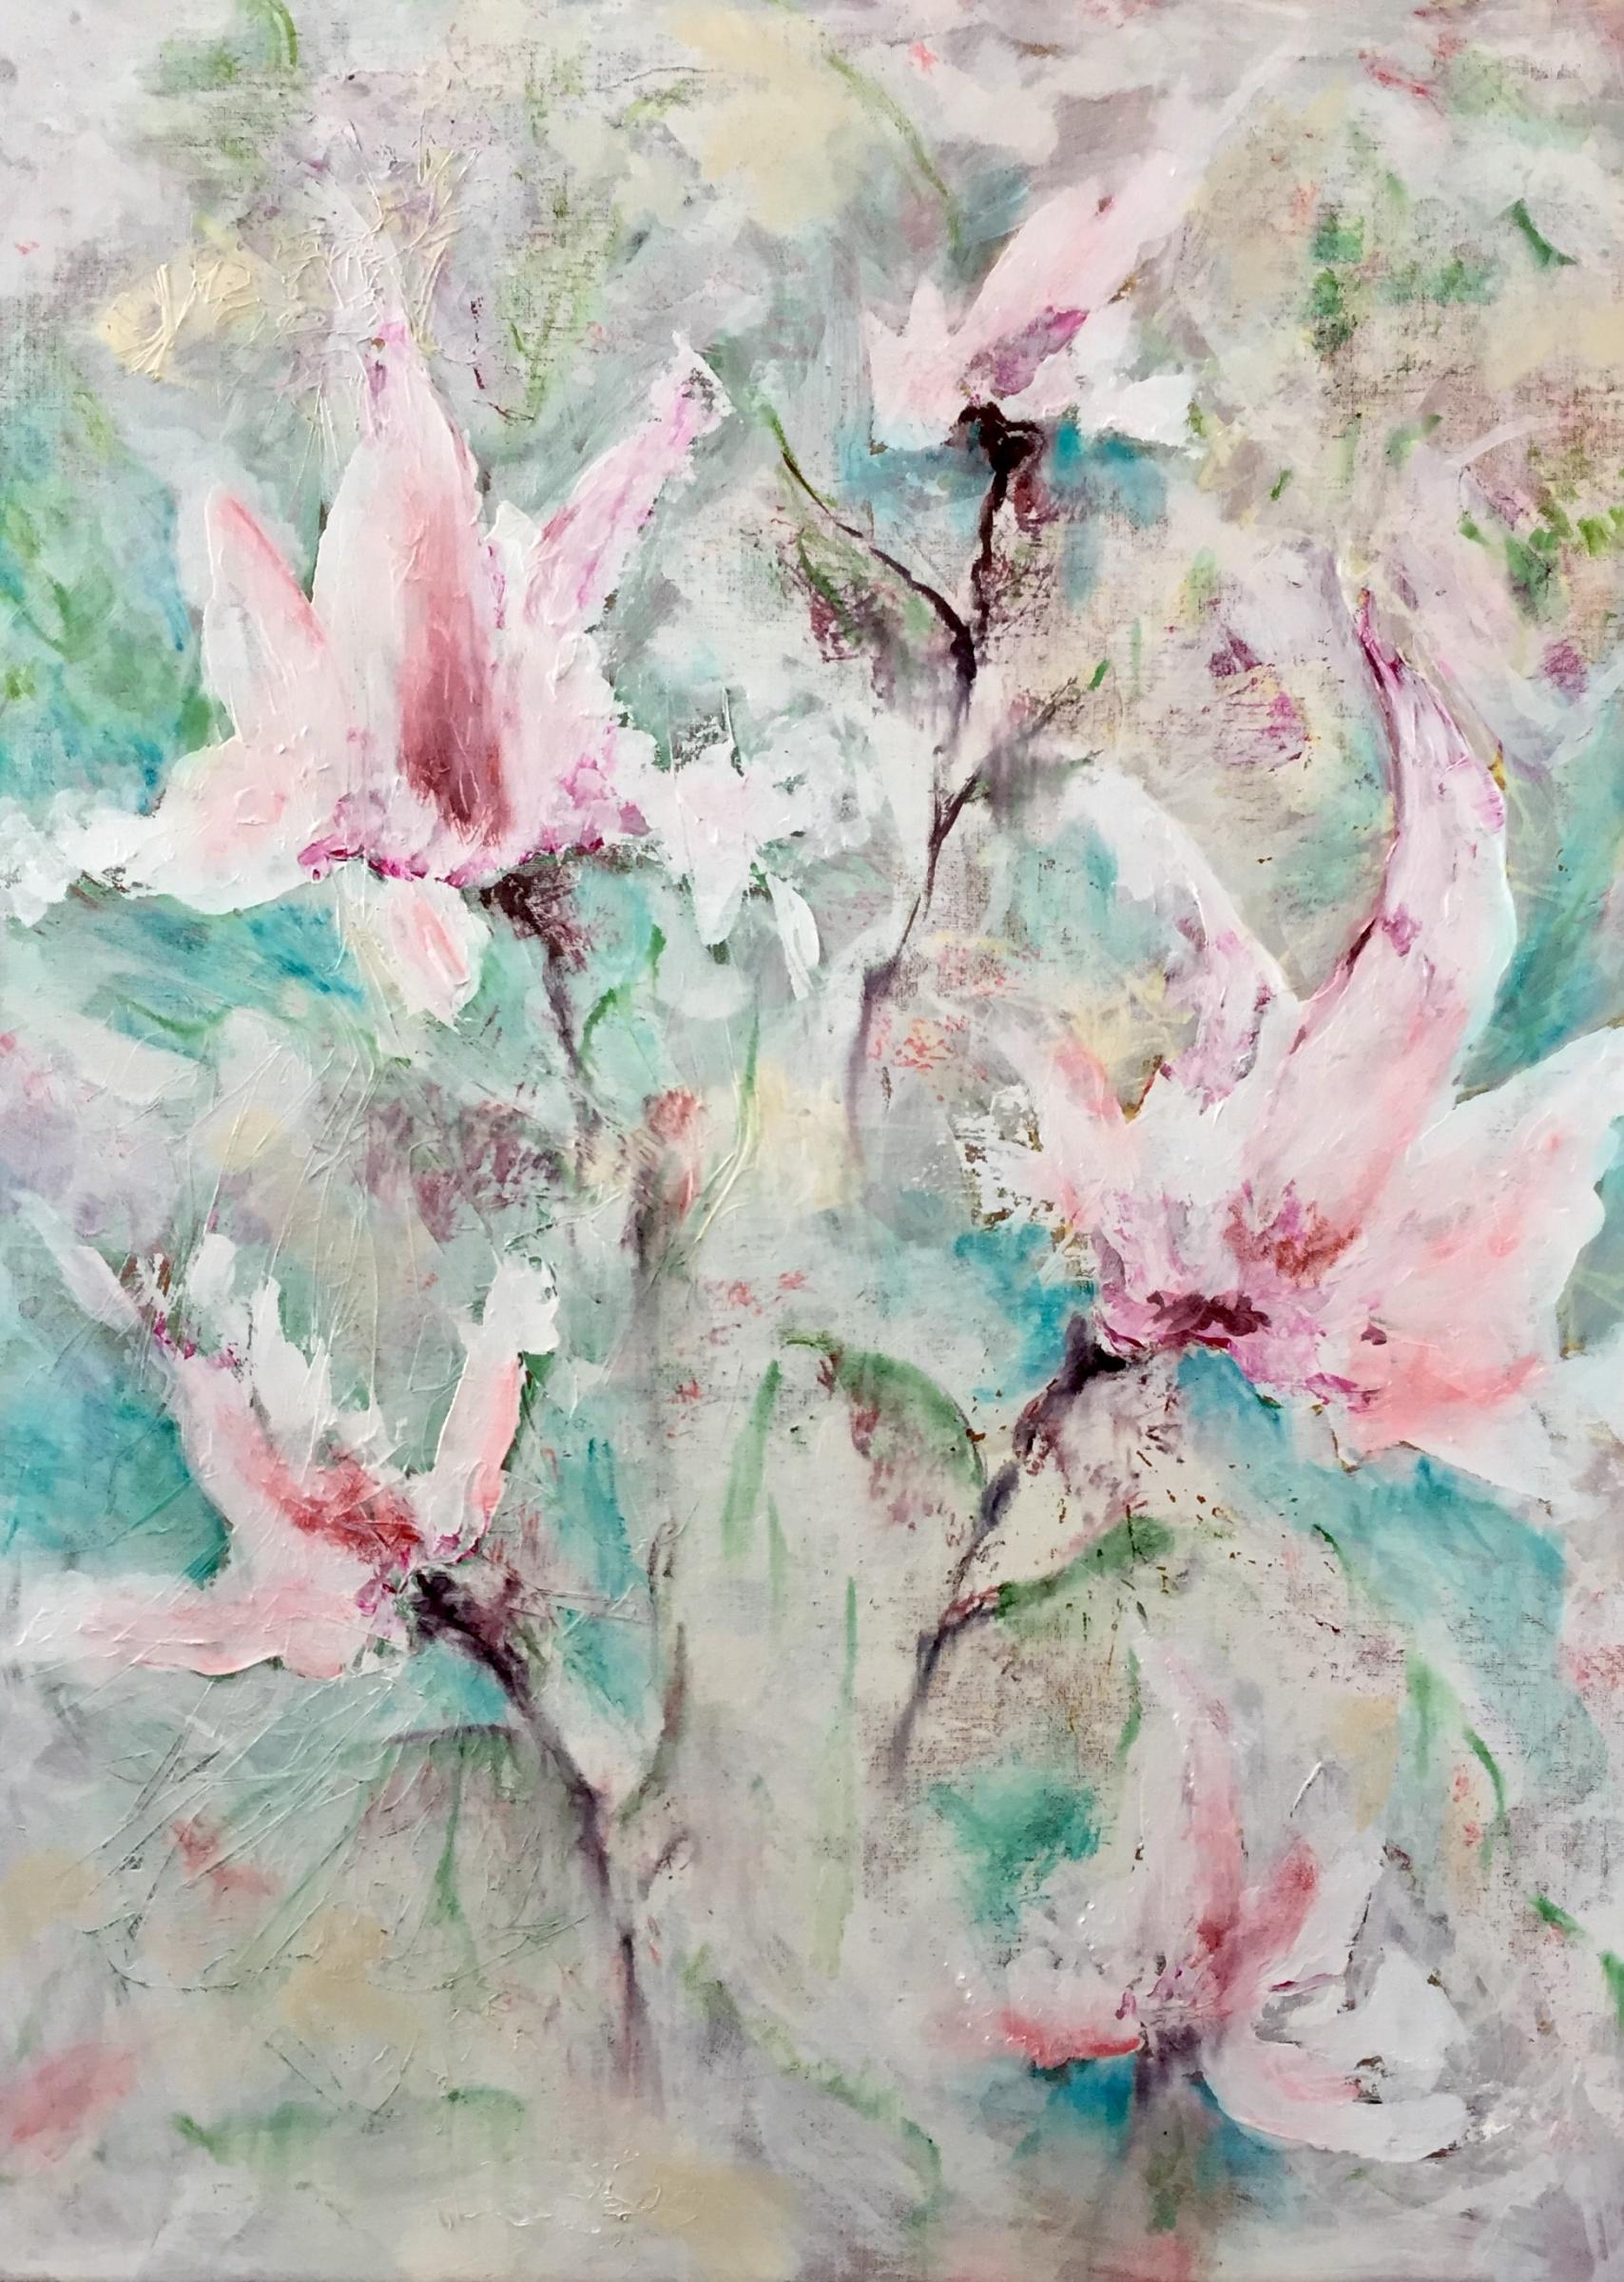 Hope Springs Eternal by Cynthia Matthews